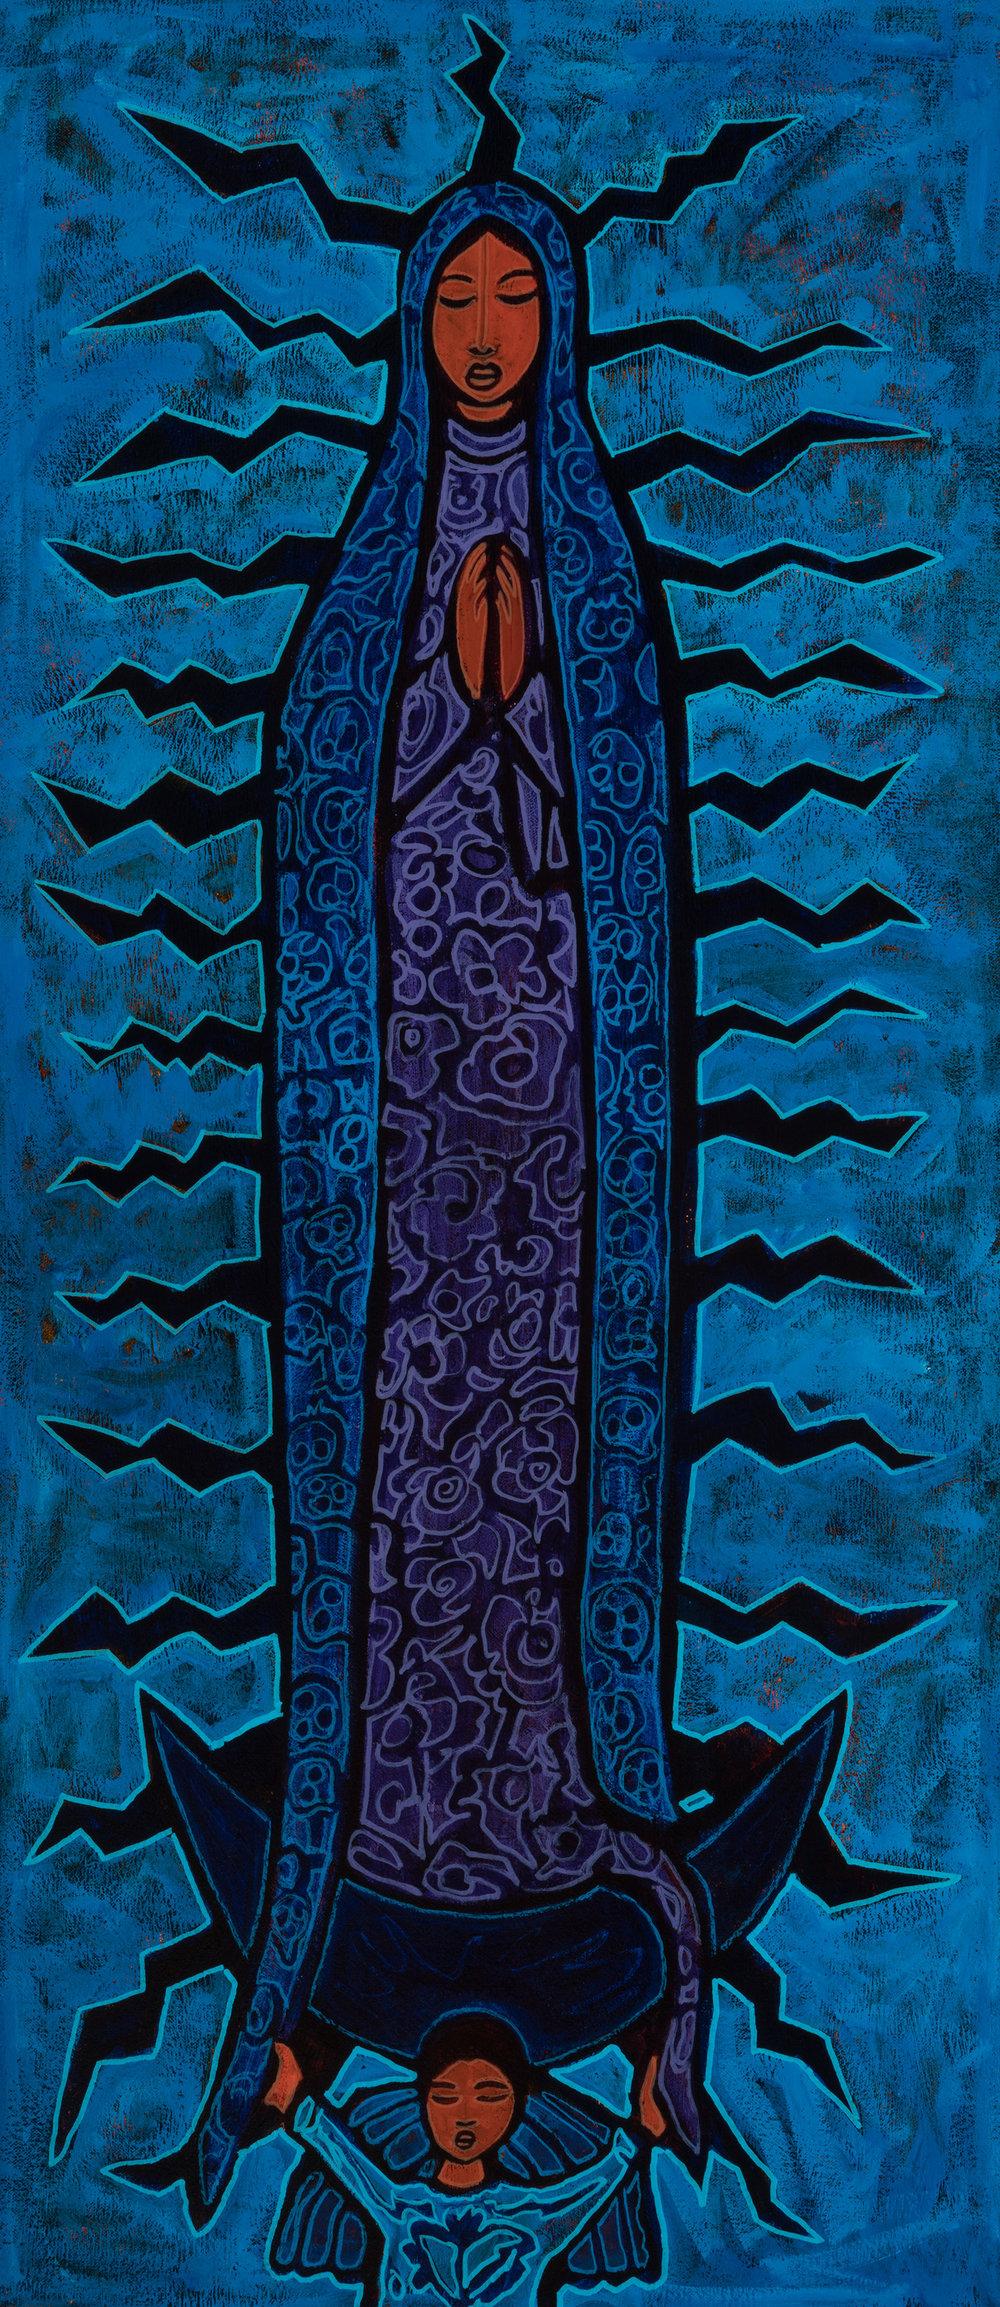 lupe azul, 2018, 16x36